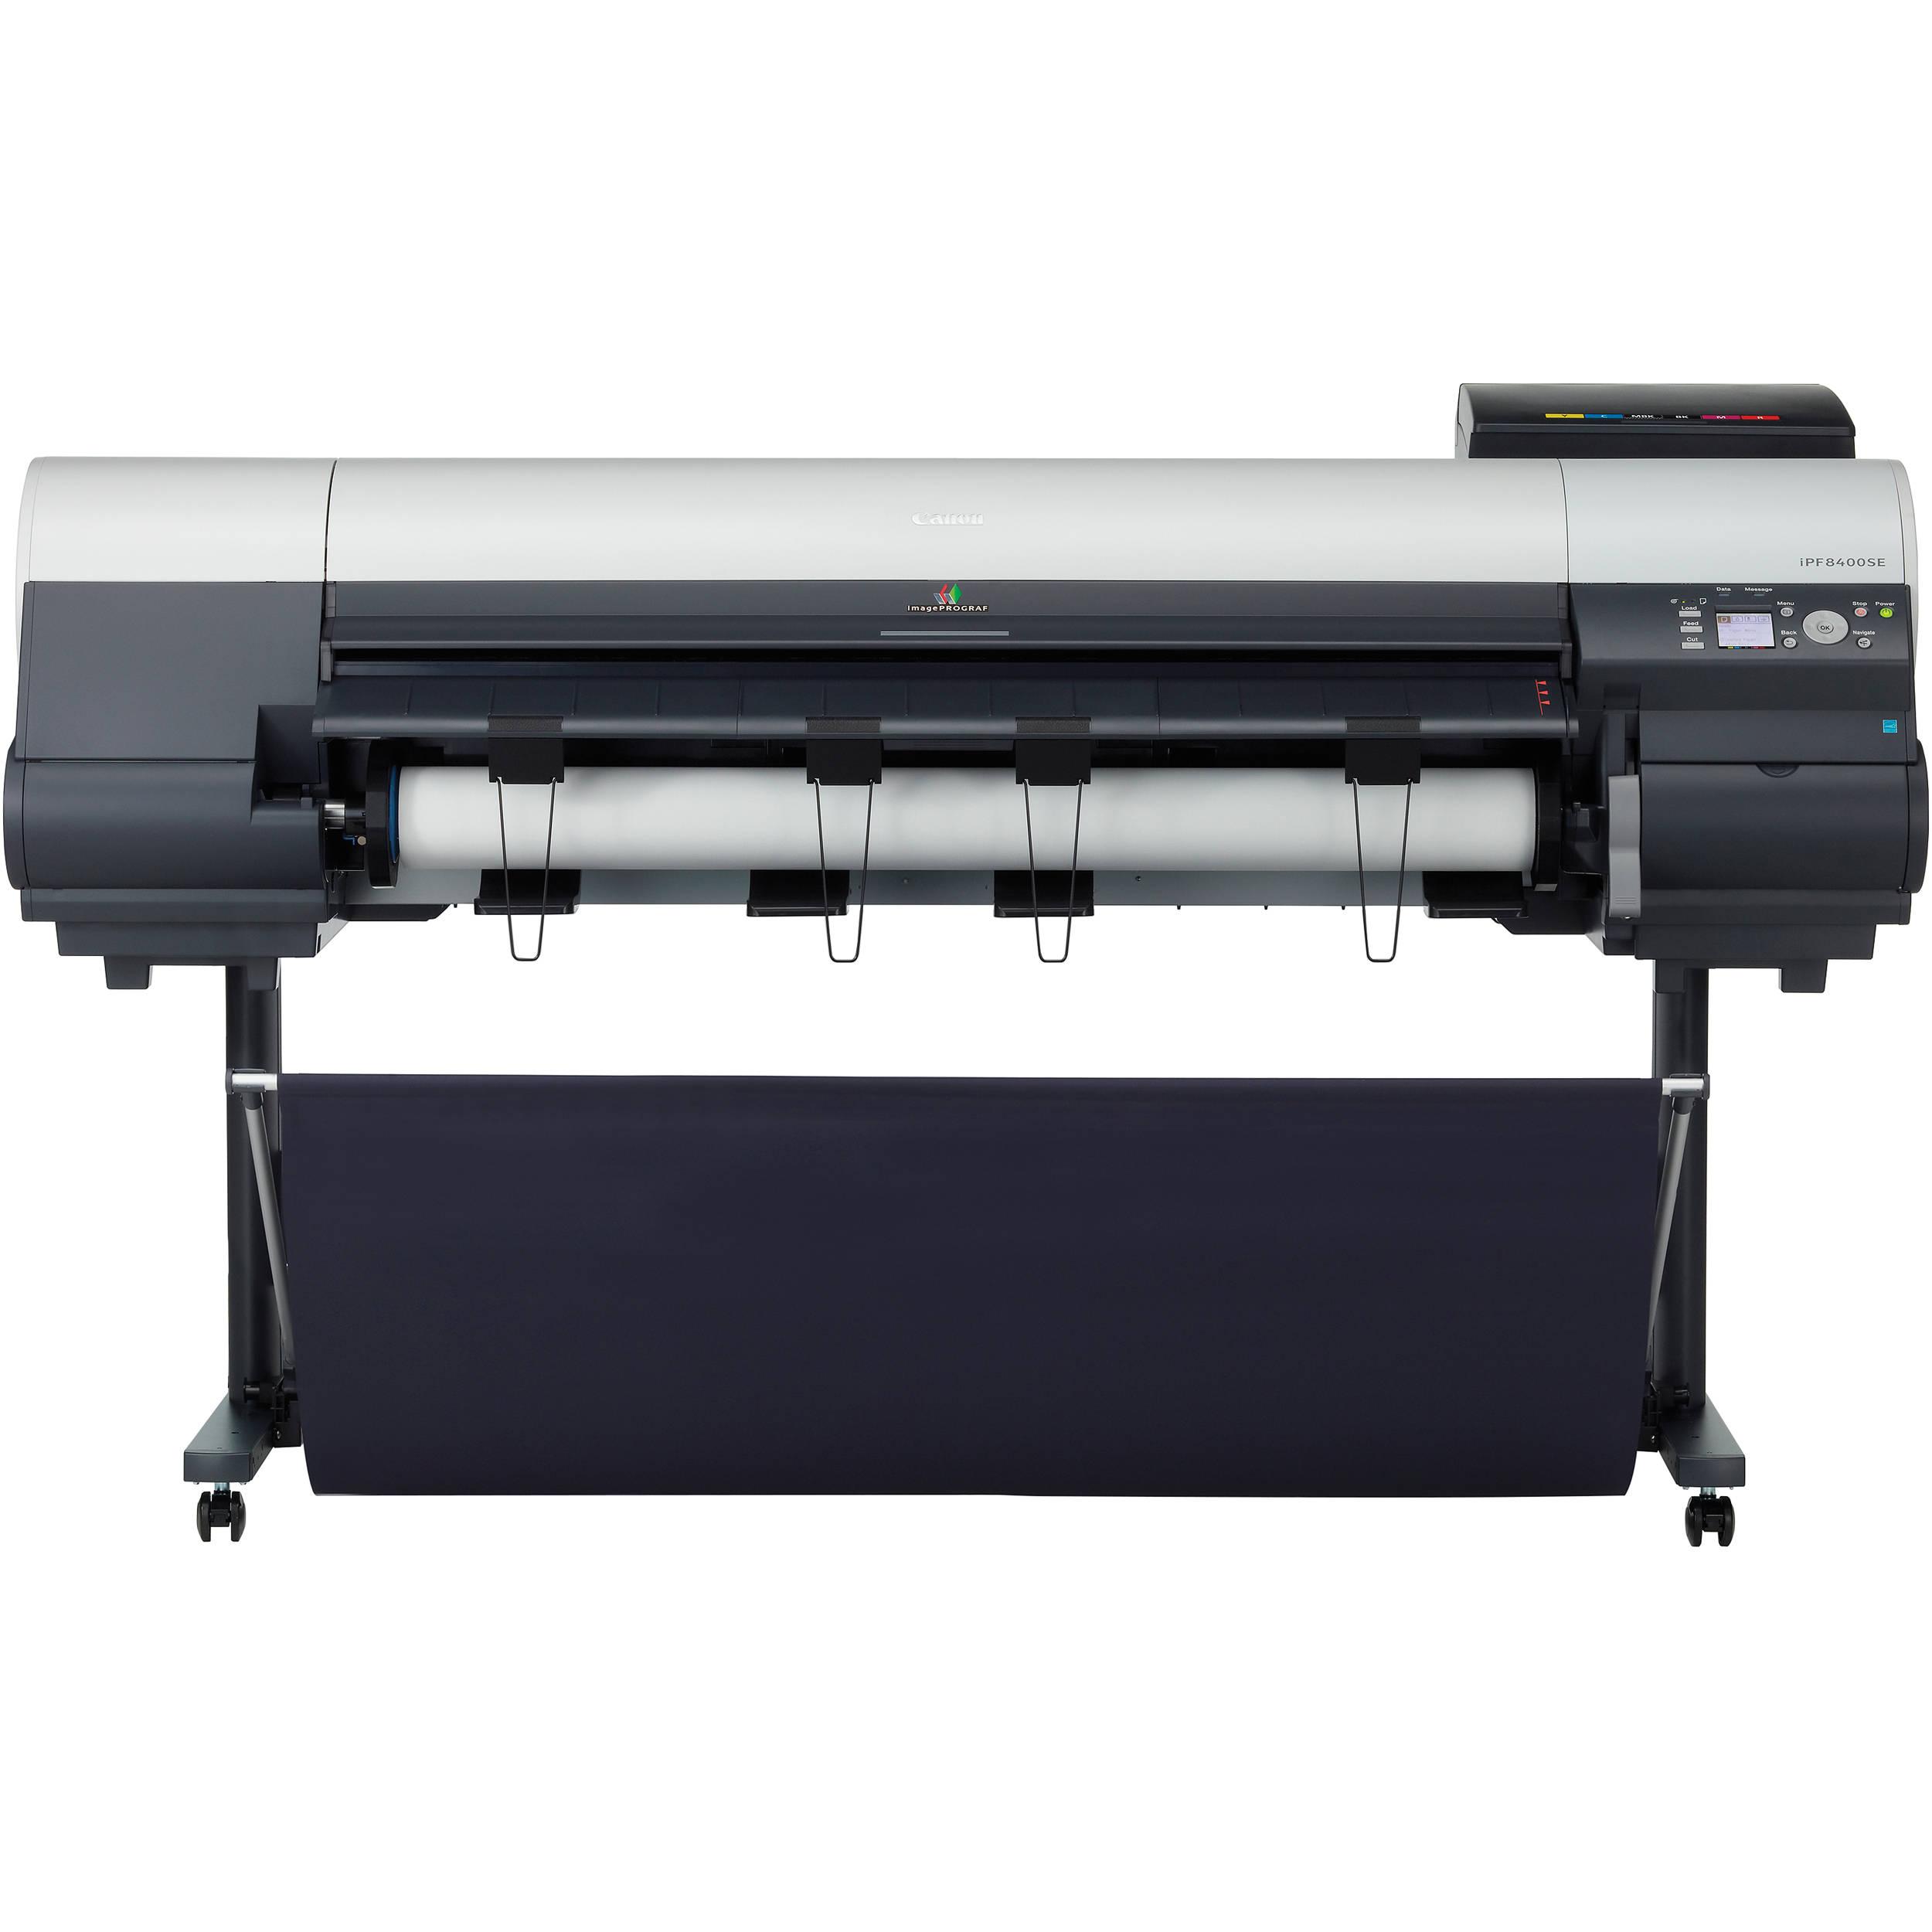 Canon ImagePROGRAF IPF8400SE 44 Large Format Inkjet Printer